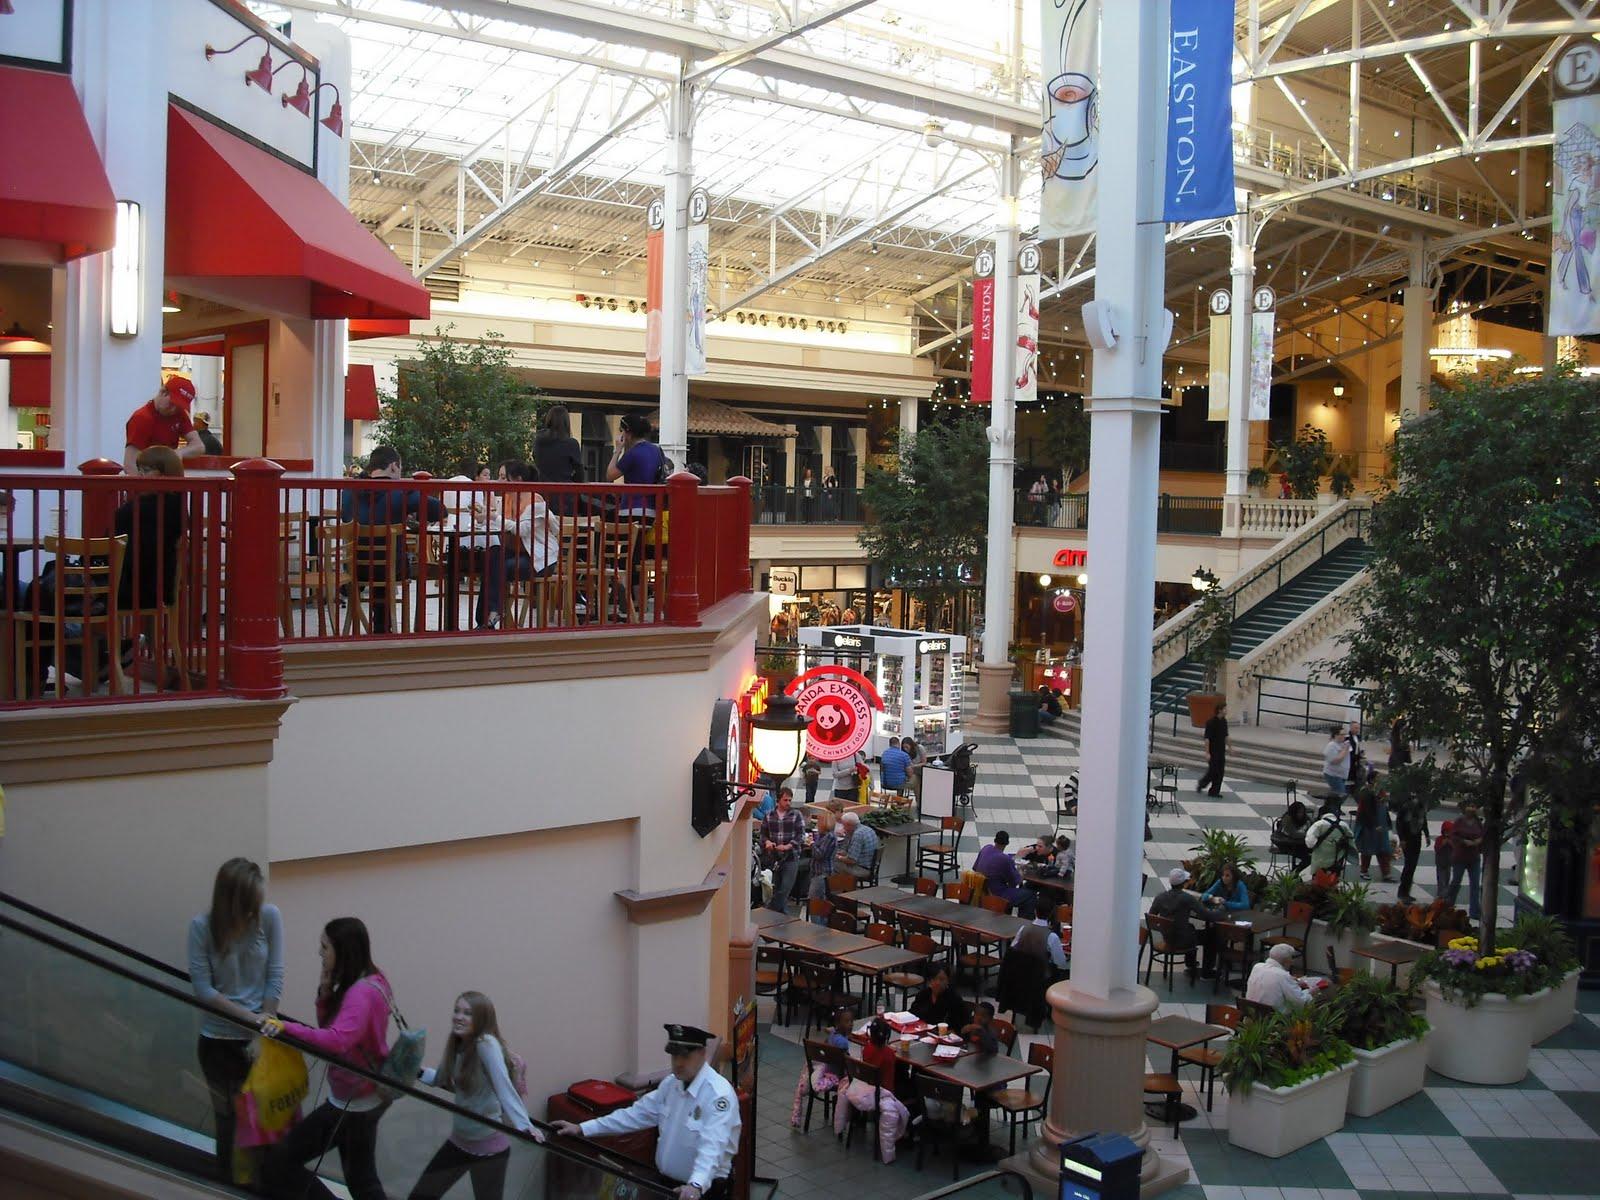 Walmart easton columbus oh : Real estate online learning